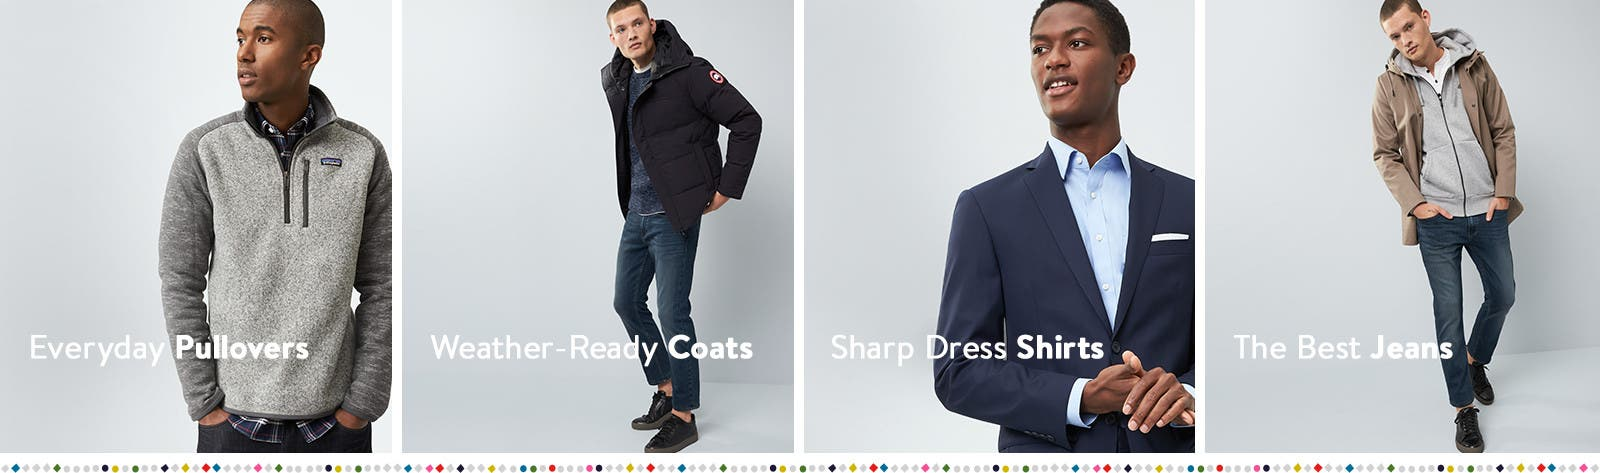 Everyday pullovers. Weather-ready coats. Sharp dress shirts. Sharp dress shirts.